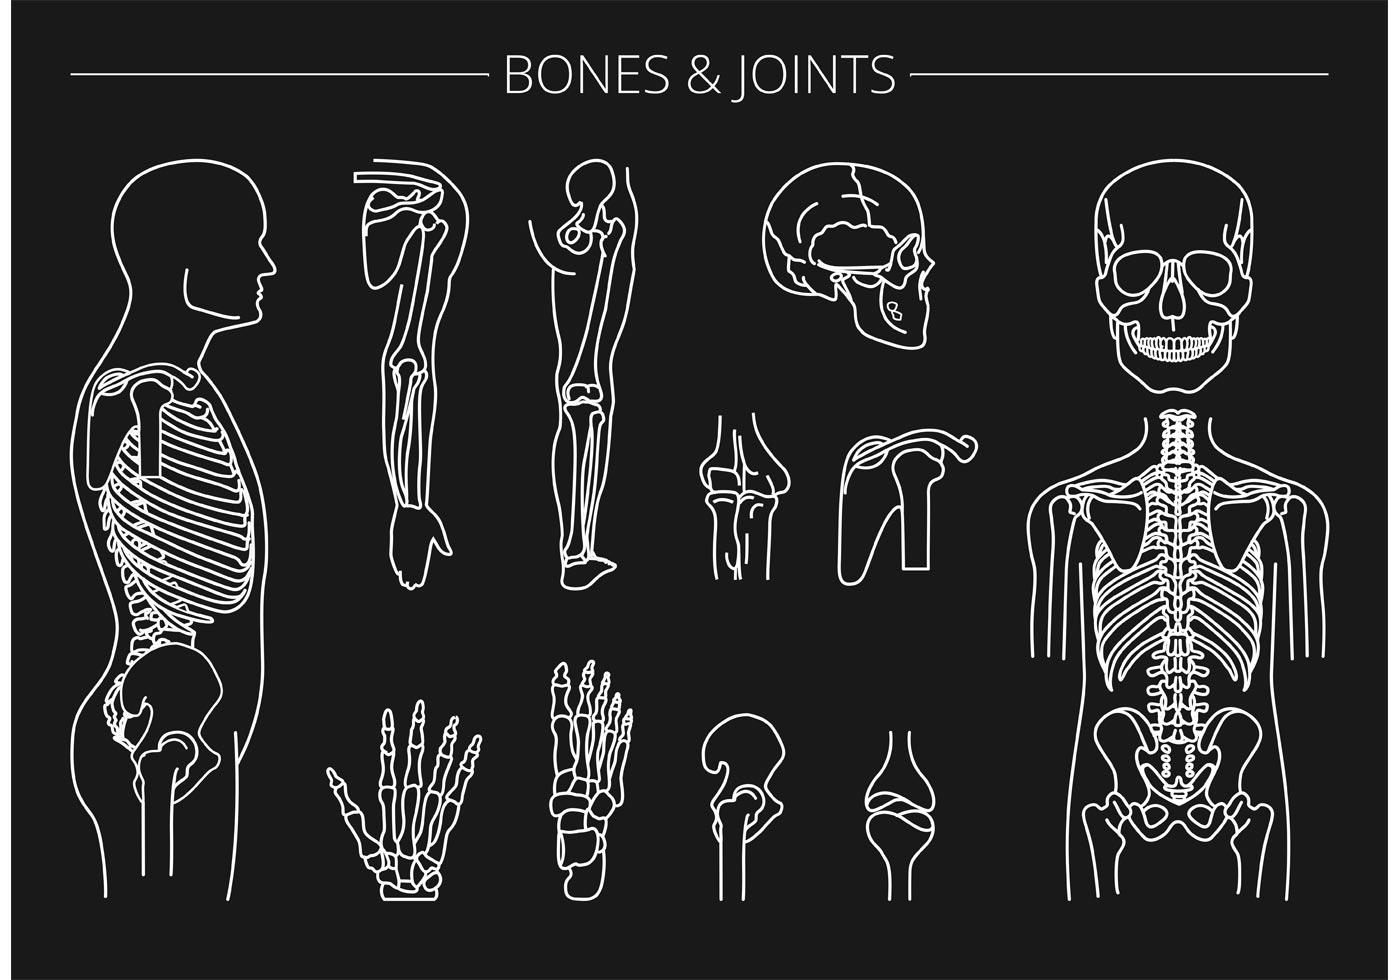 free vector bones and joints download free vector art